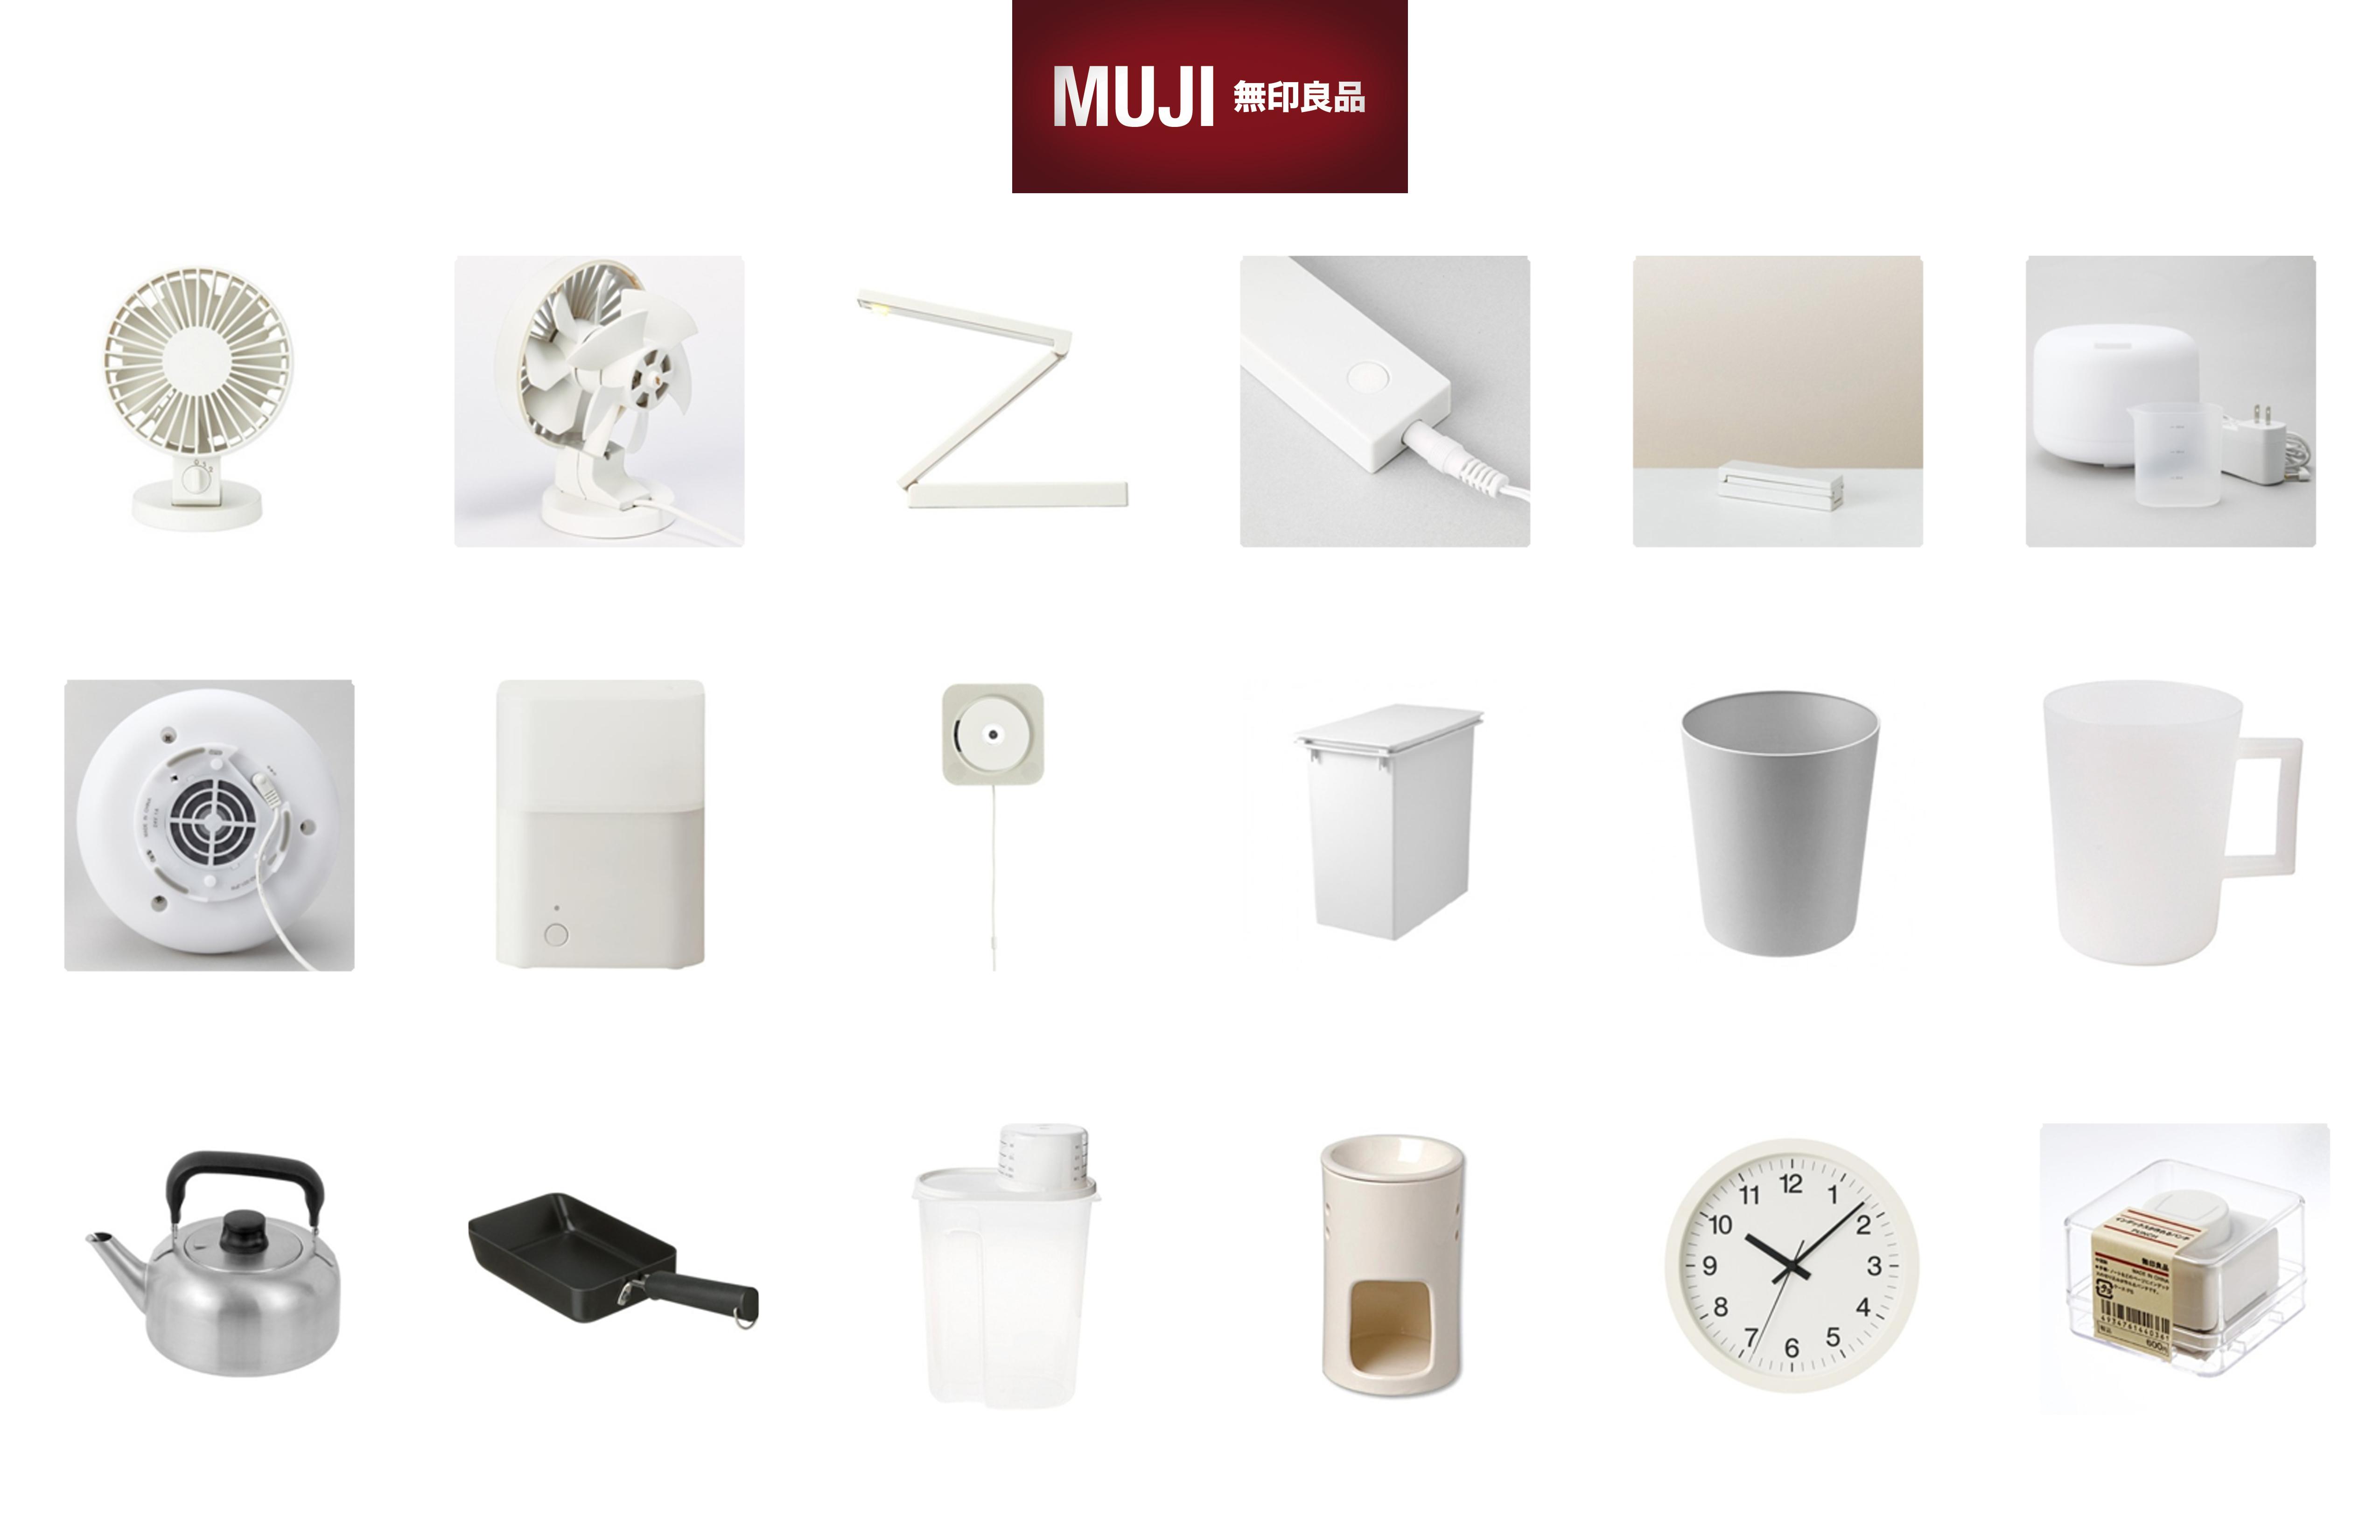 Electric Kettle For MUJI Bai